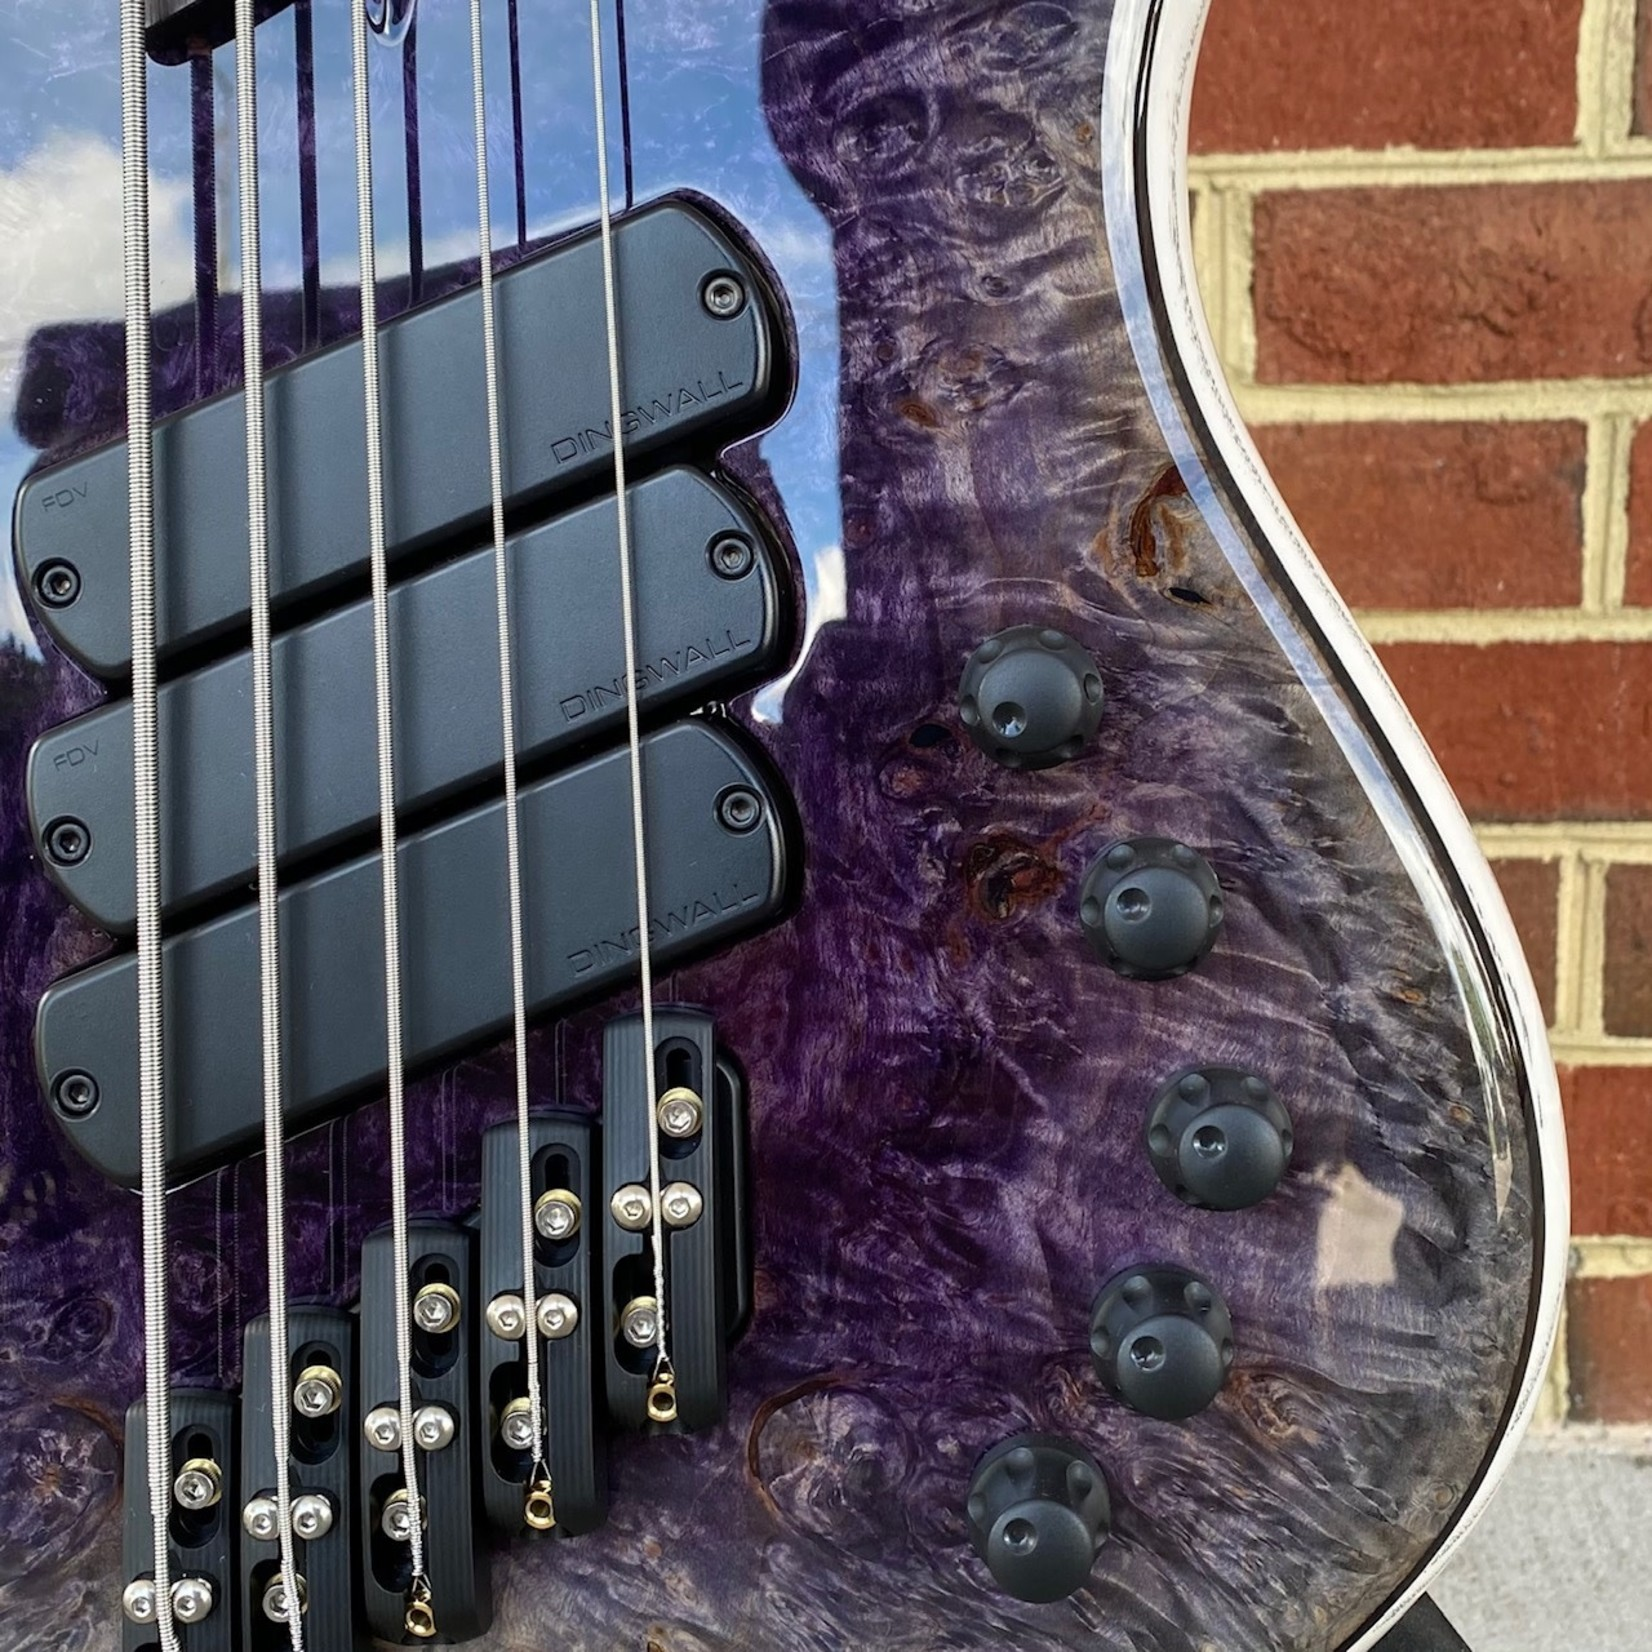 Dingwall Dingwall Z3 Custom 5-String, 3x Pickups, Burl Maple X-Top, Wenge Contrast Layer, Dual Density Swamp Ash Body, Faded Purple Reverse Burst Top, White w/ Black Grain Fill Back, Wenge Neck & Fretboard, White Pearloid Block Inlays, Blue Luminlay Side Dots